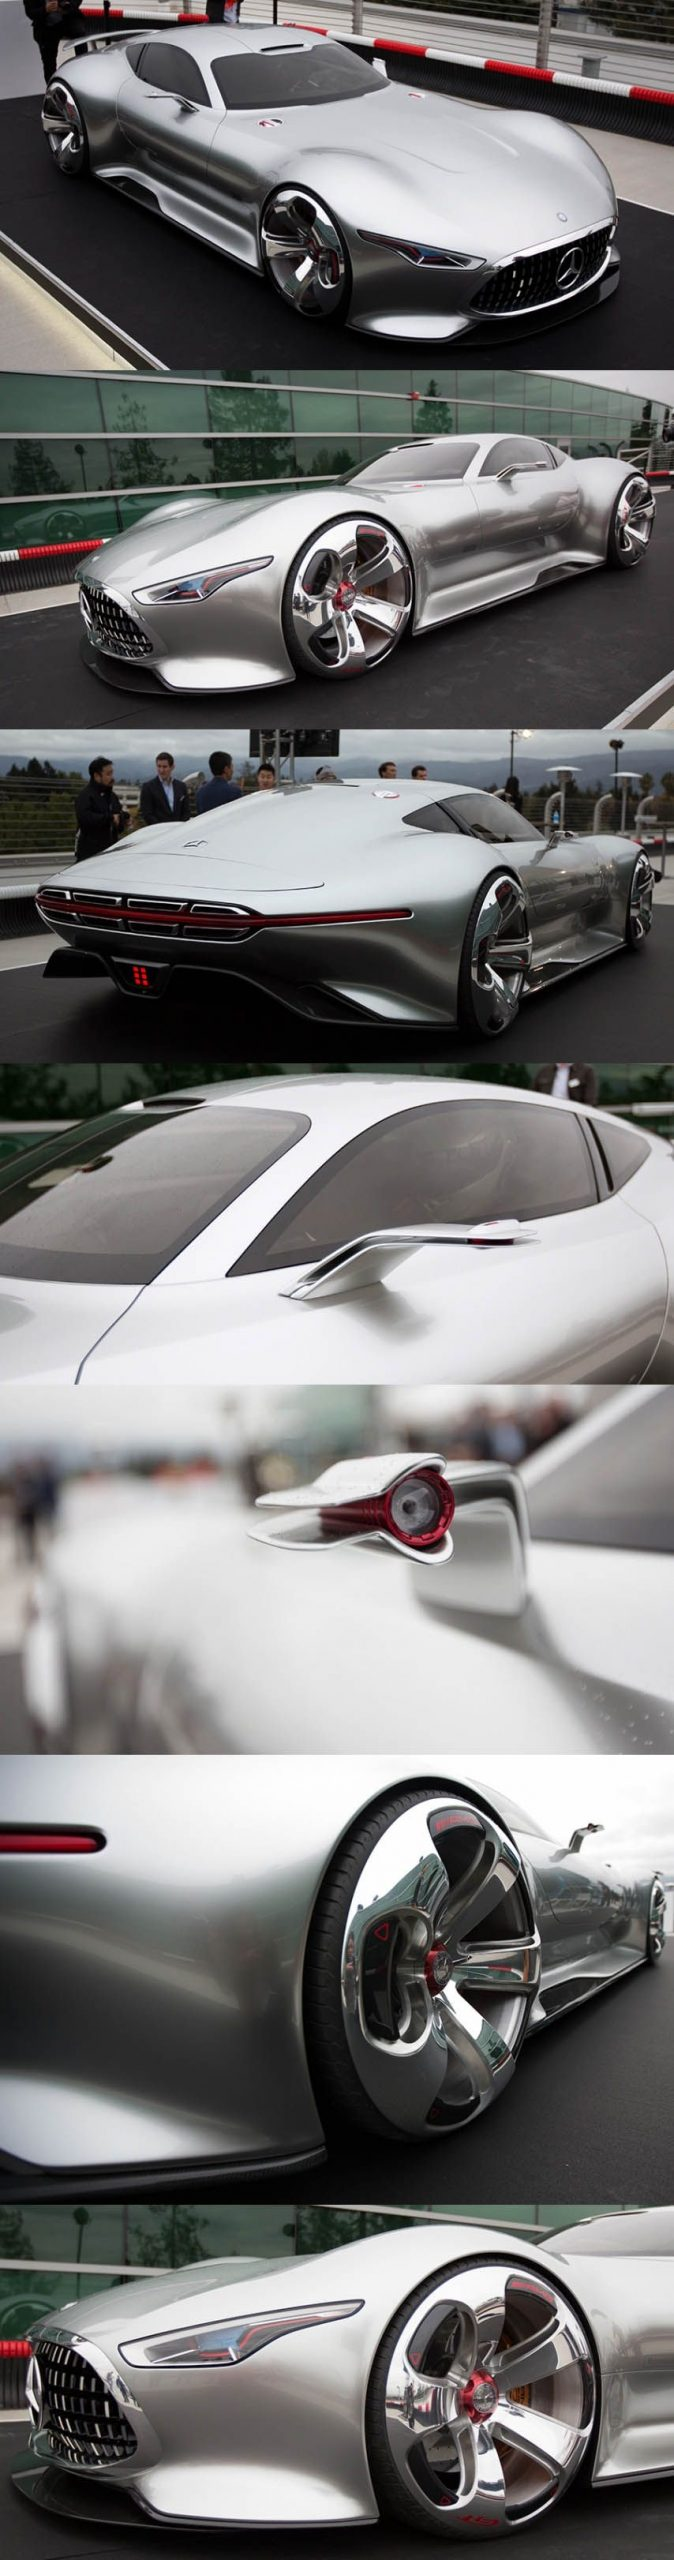 Mercedes-AMG Vision Gran Turismo concept